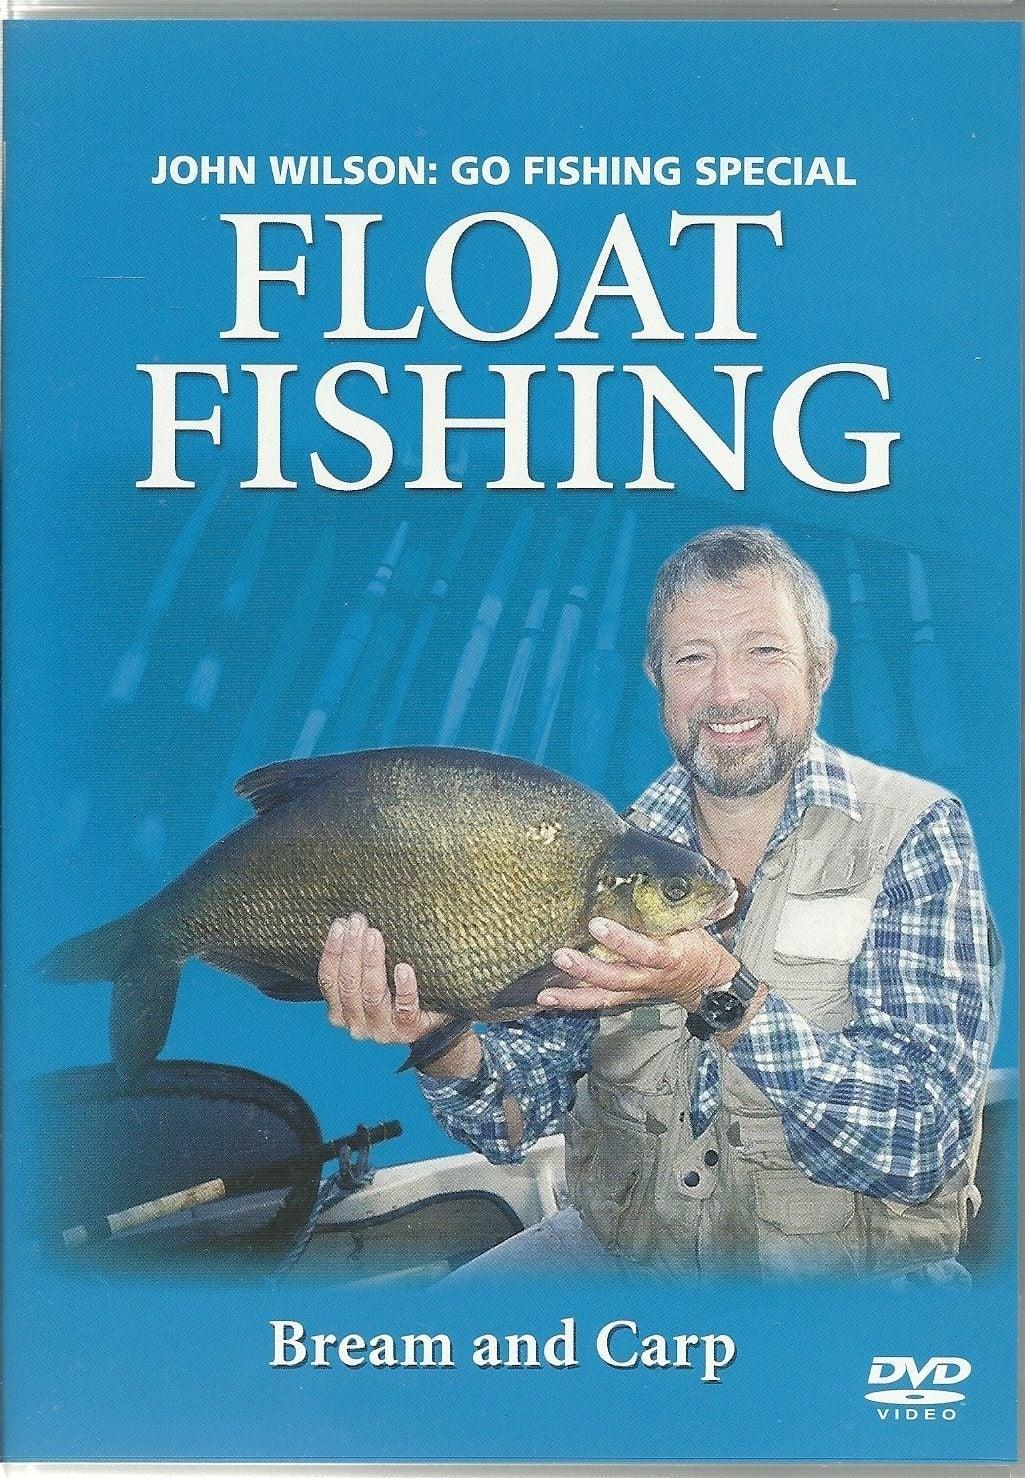 John Wilson: Go Fishing Special FLOAT FISHING (2004)